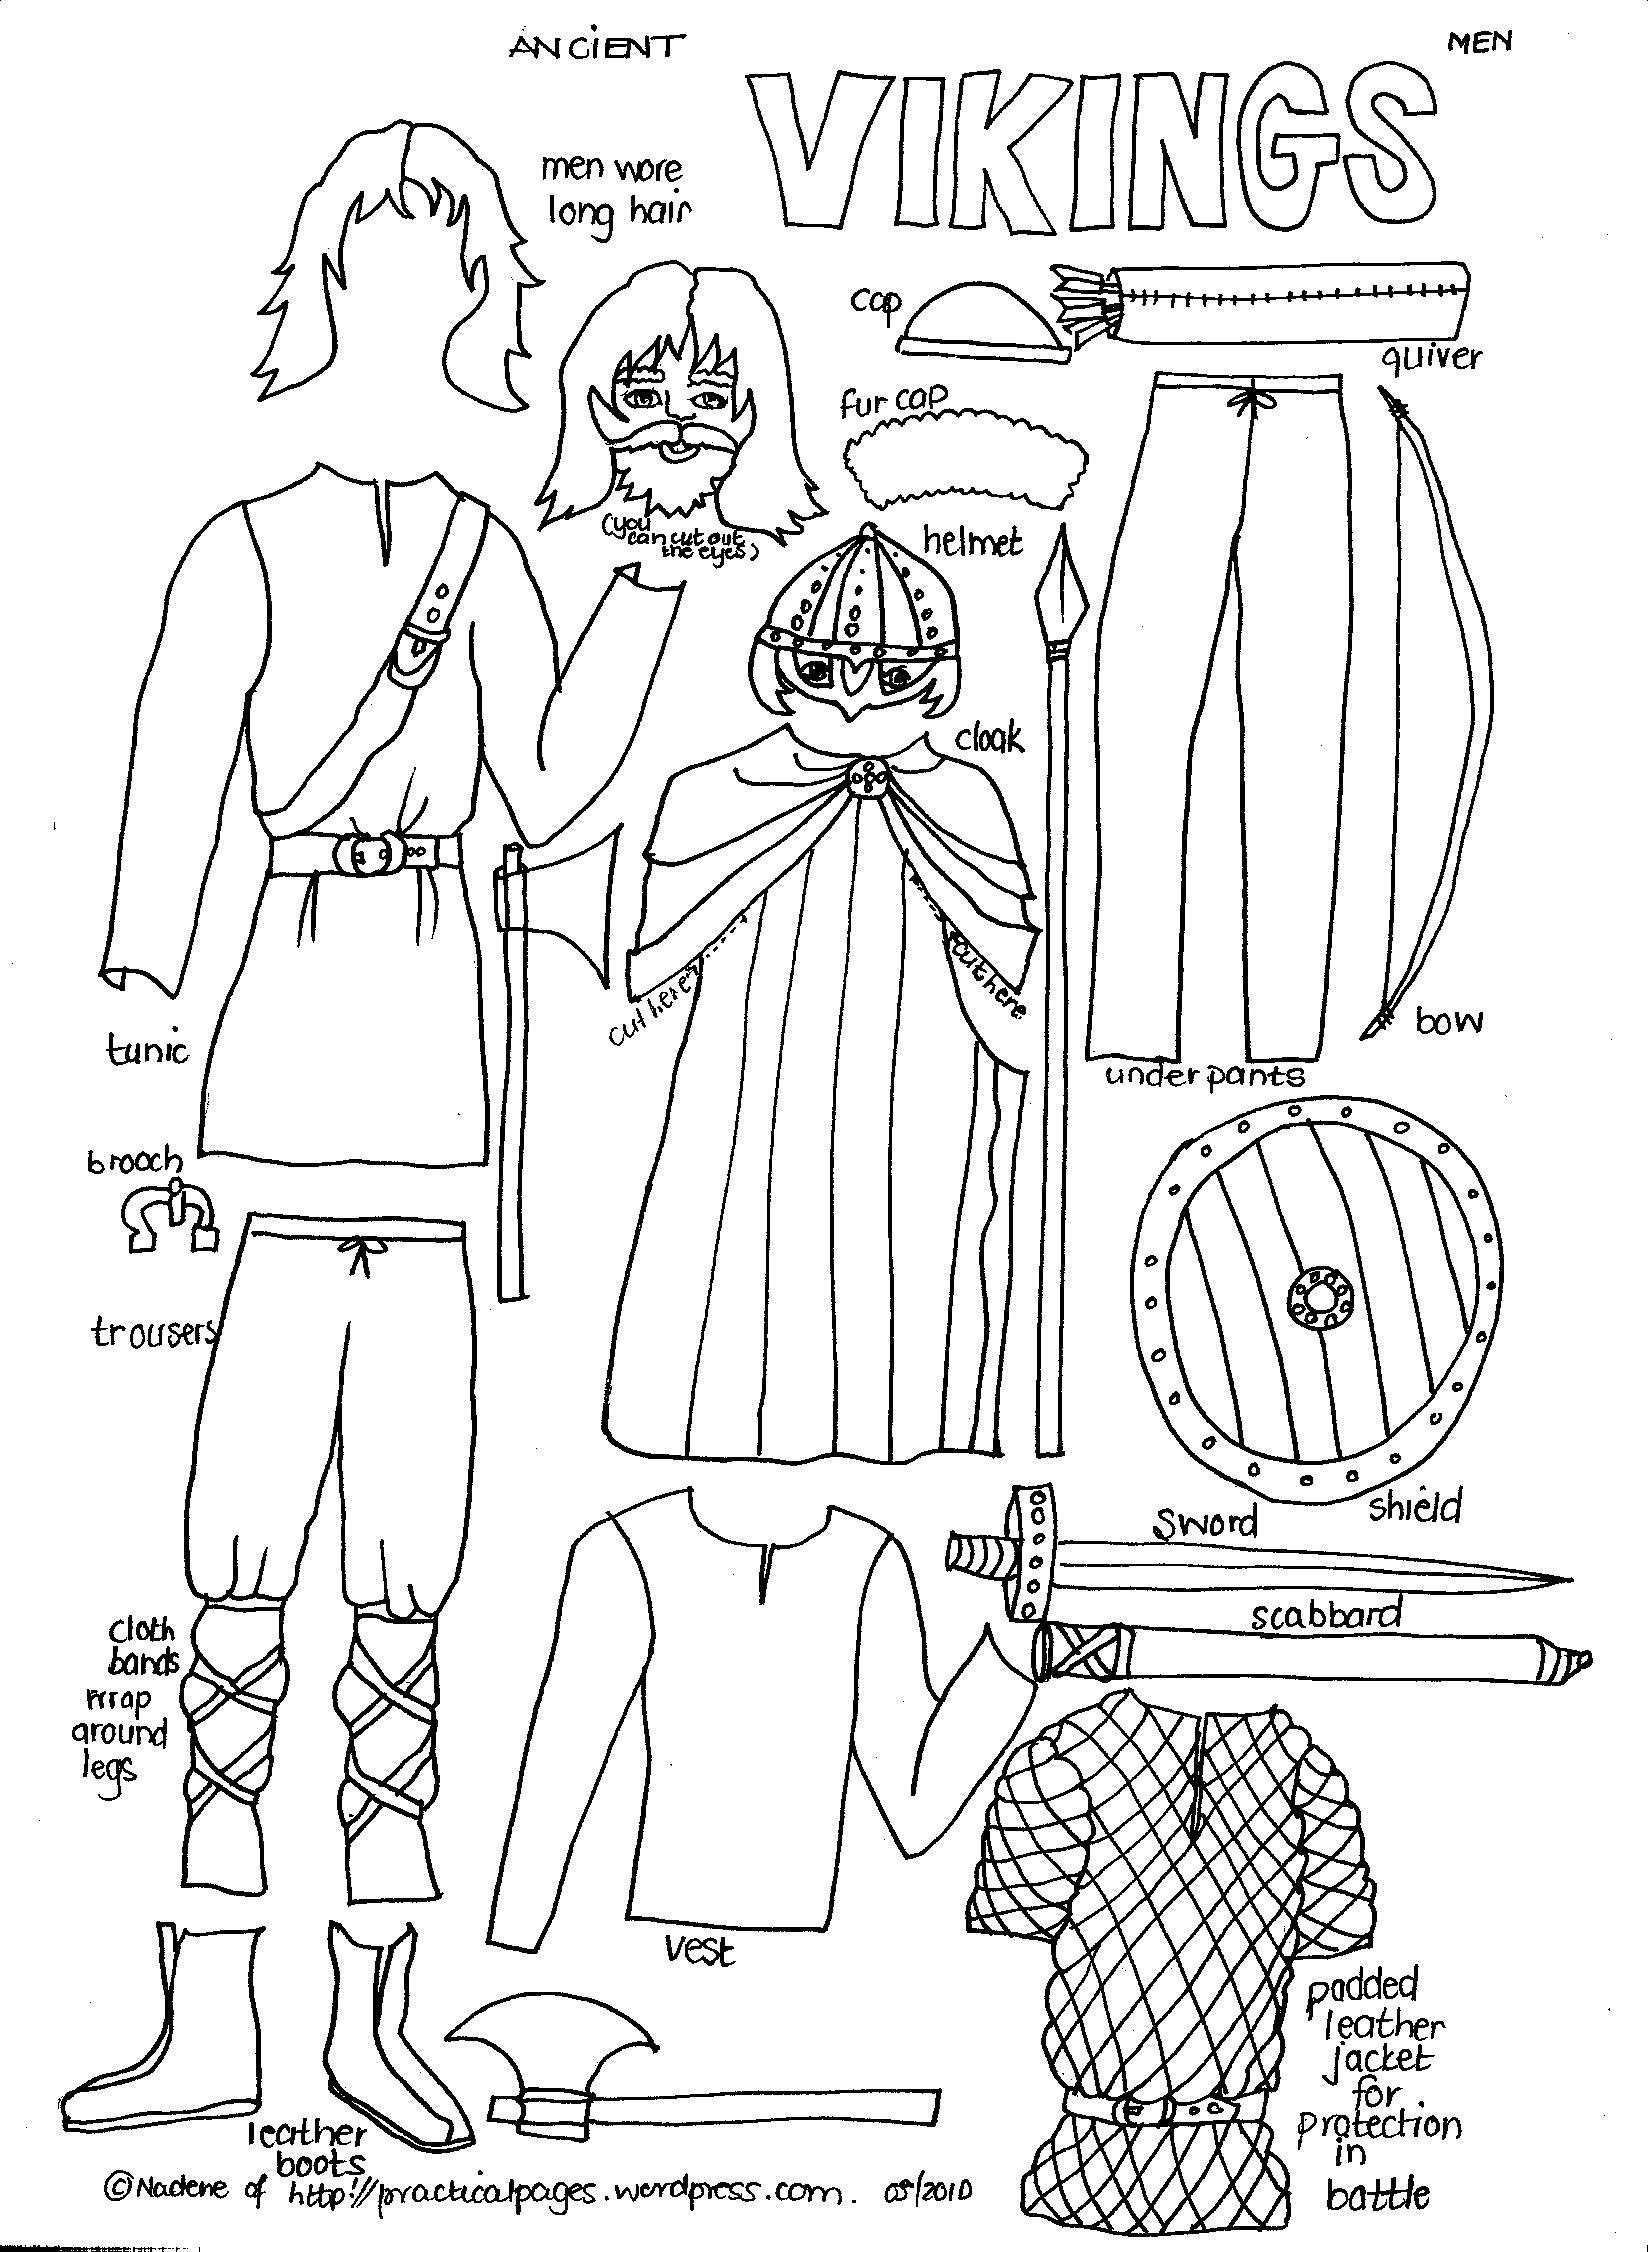 Paper Dolls | Ancient vikings, Vikings and Hand drawn